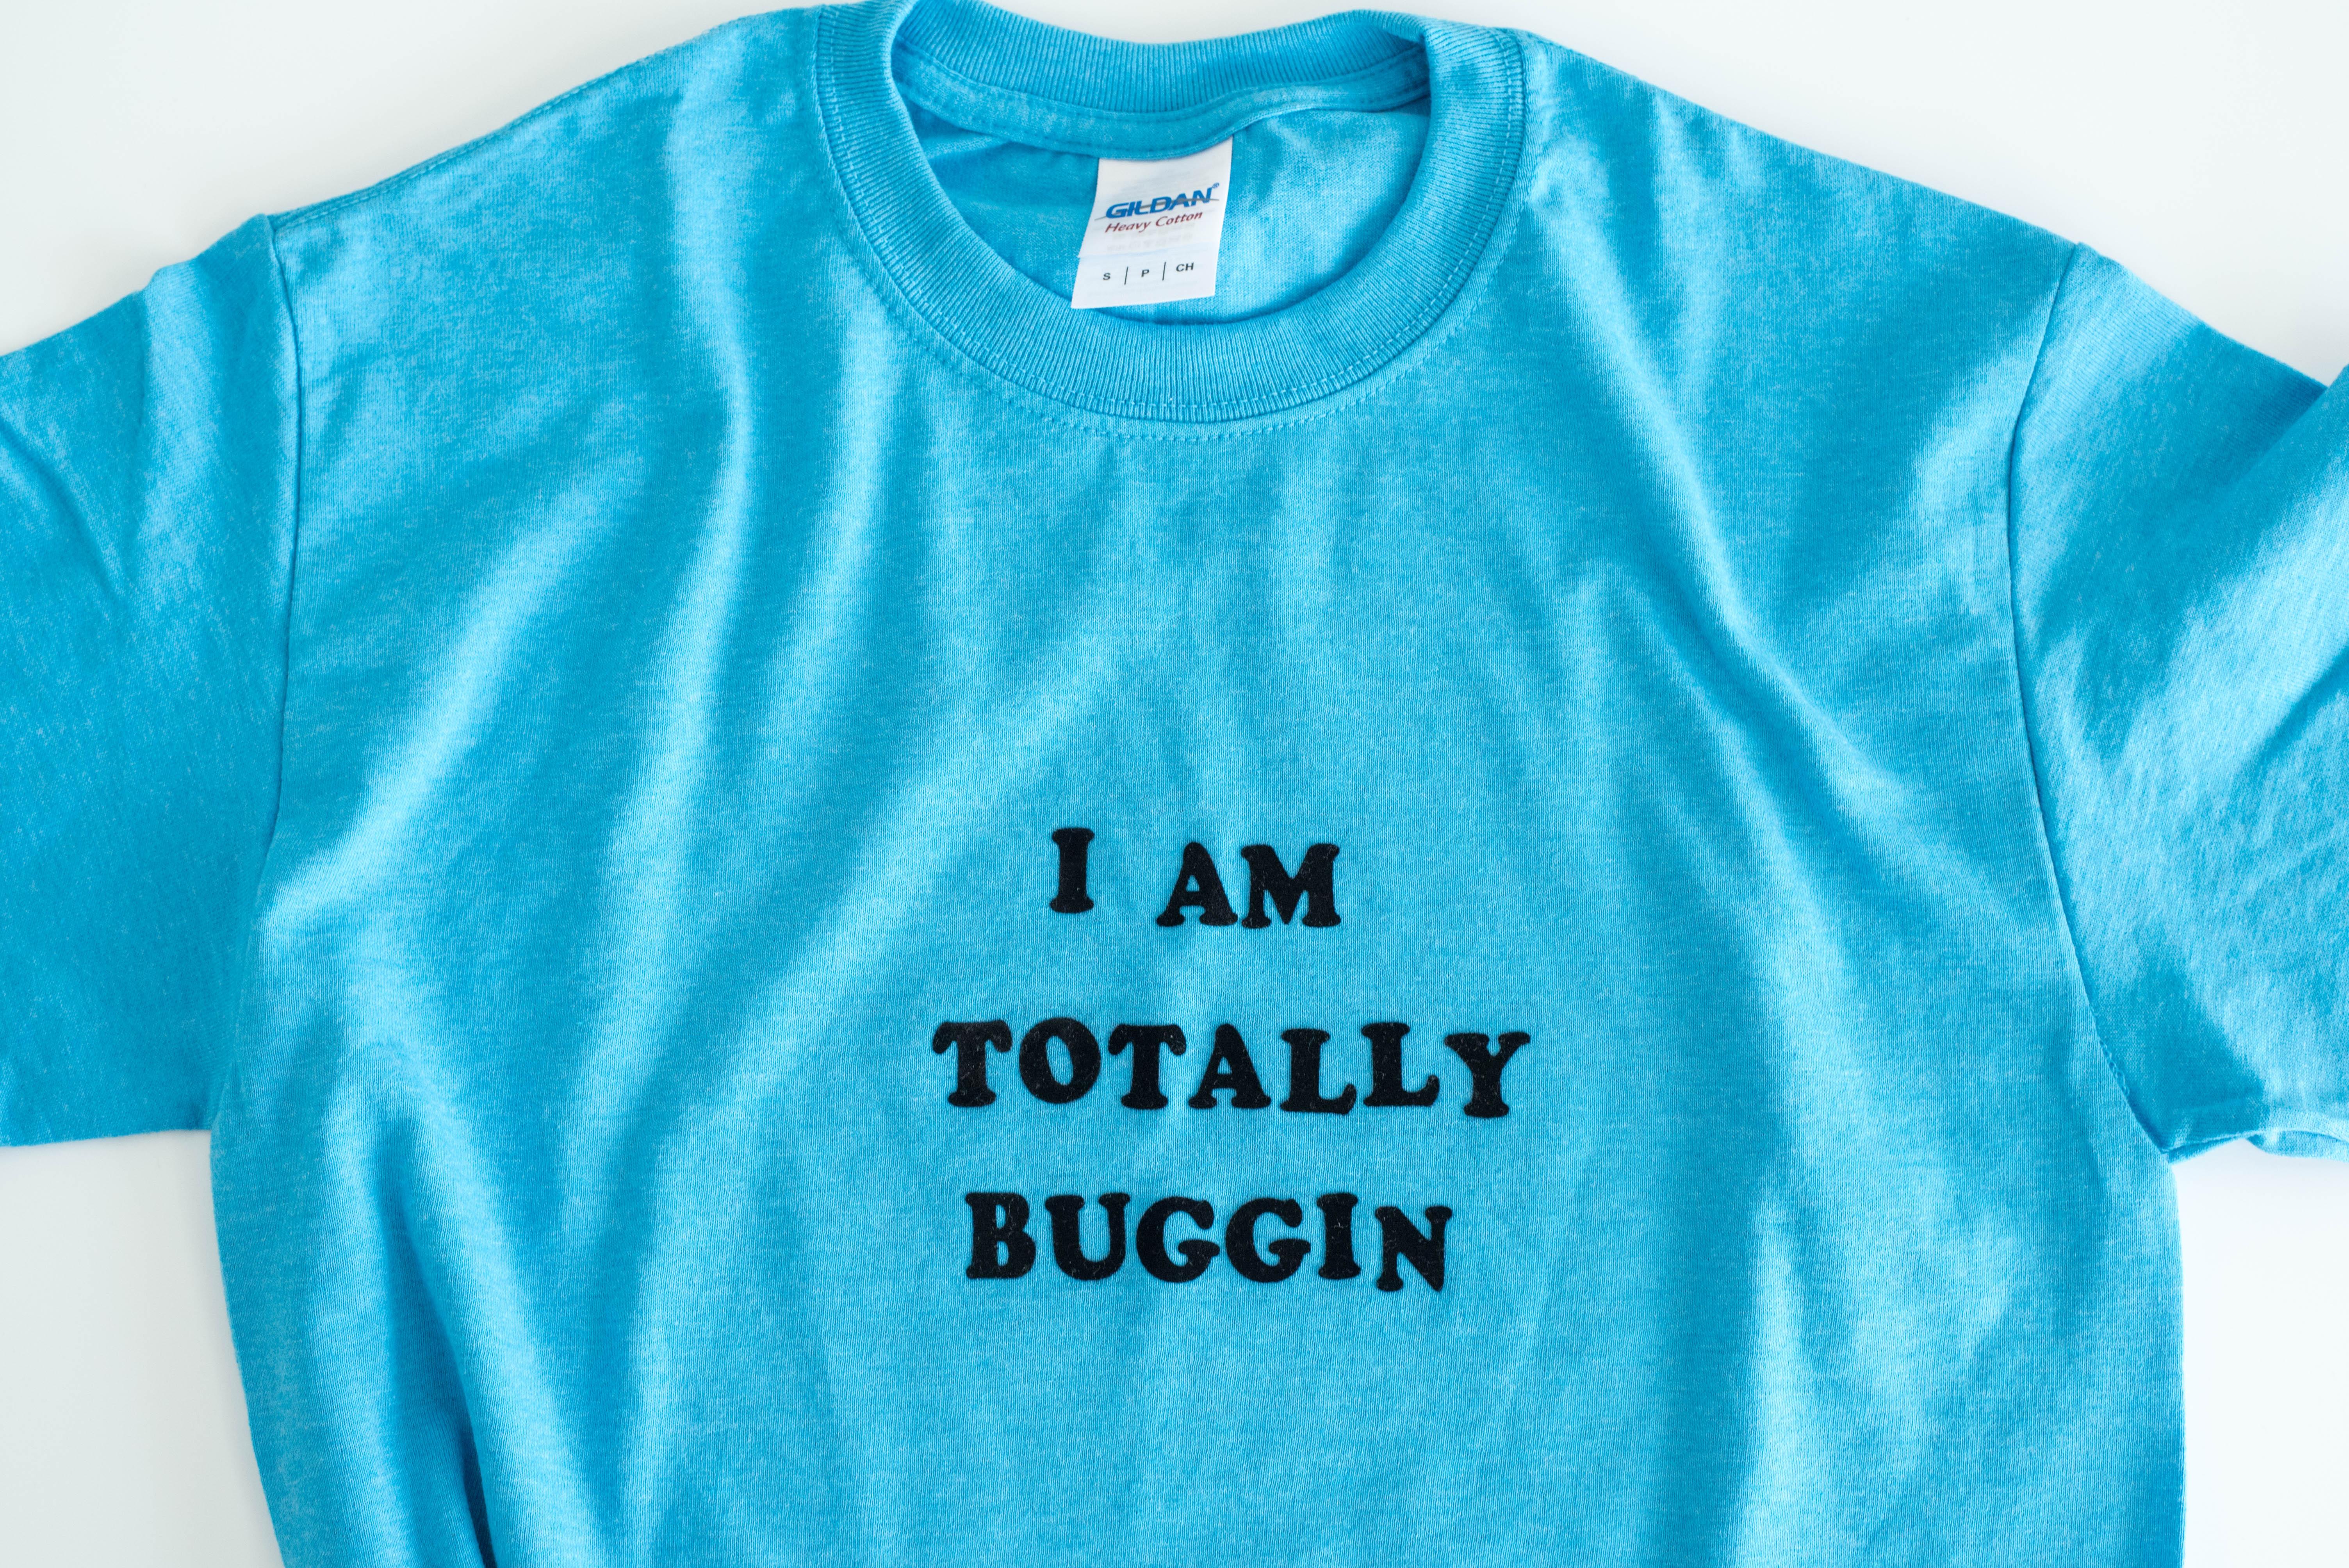 diy iron on clueless shirts let s mingle blog